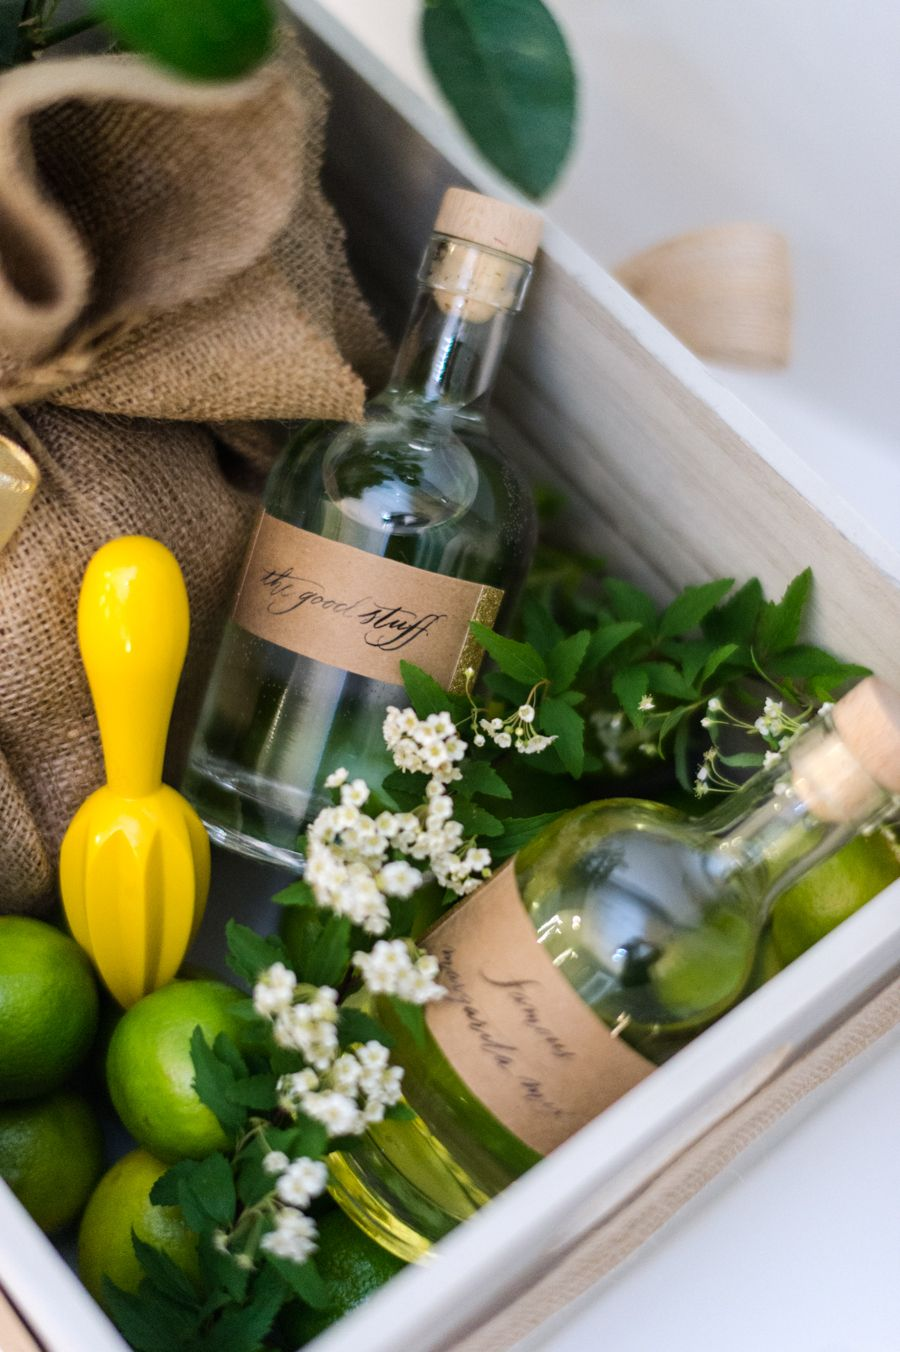 Diy margarita gift crate diy wine gift baskets gift